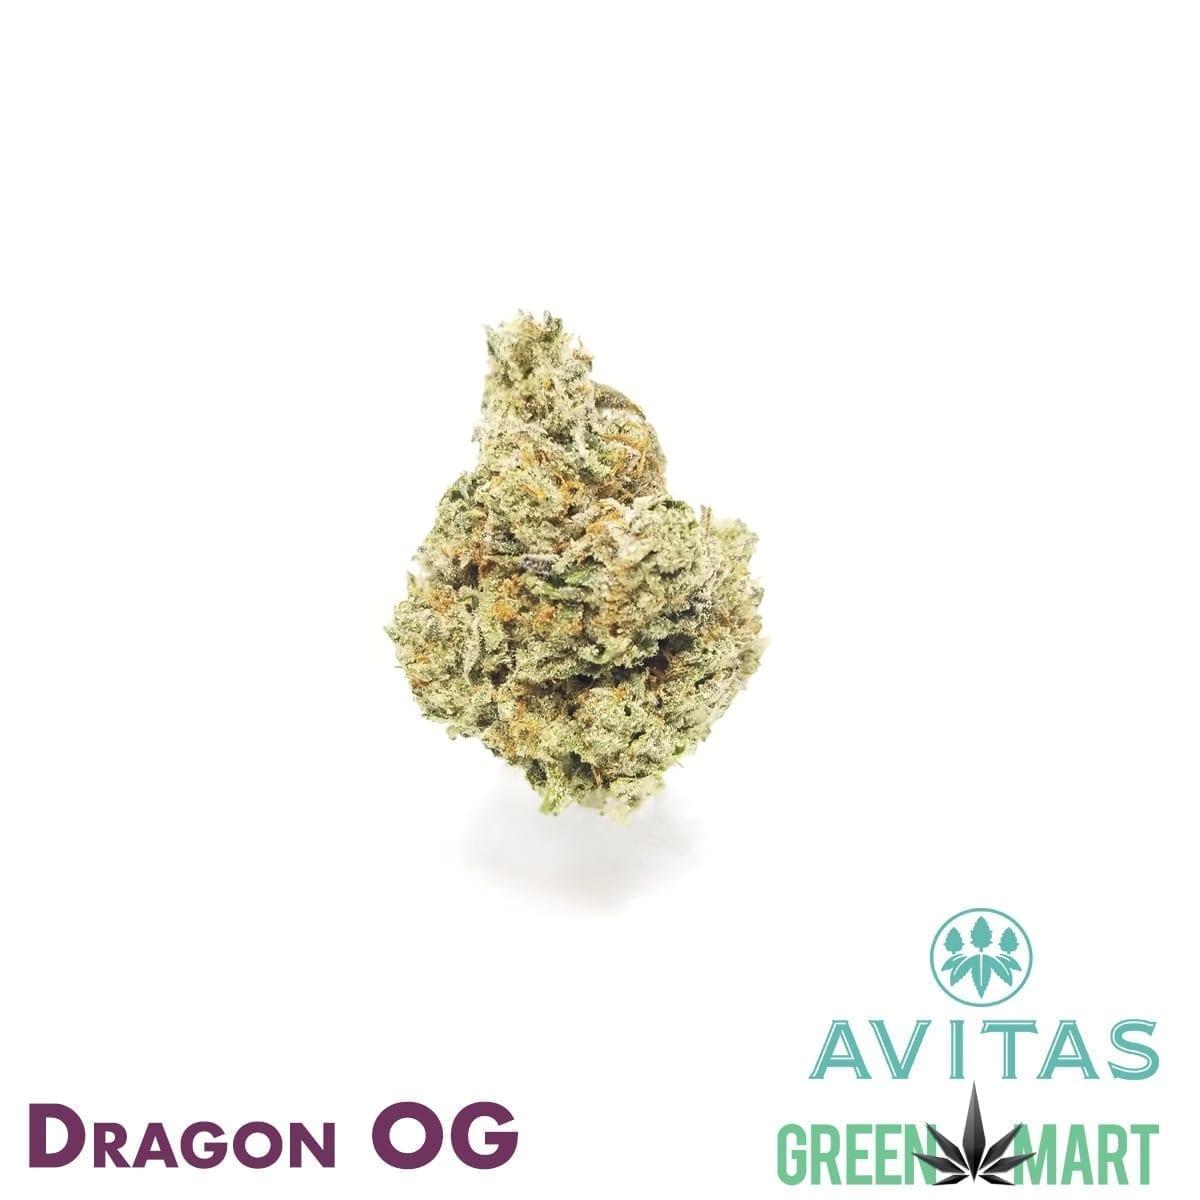 Dragon OG by Avitas